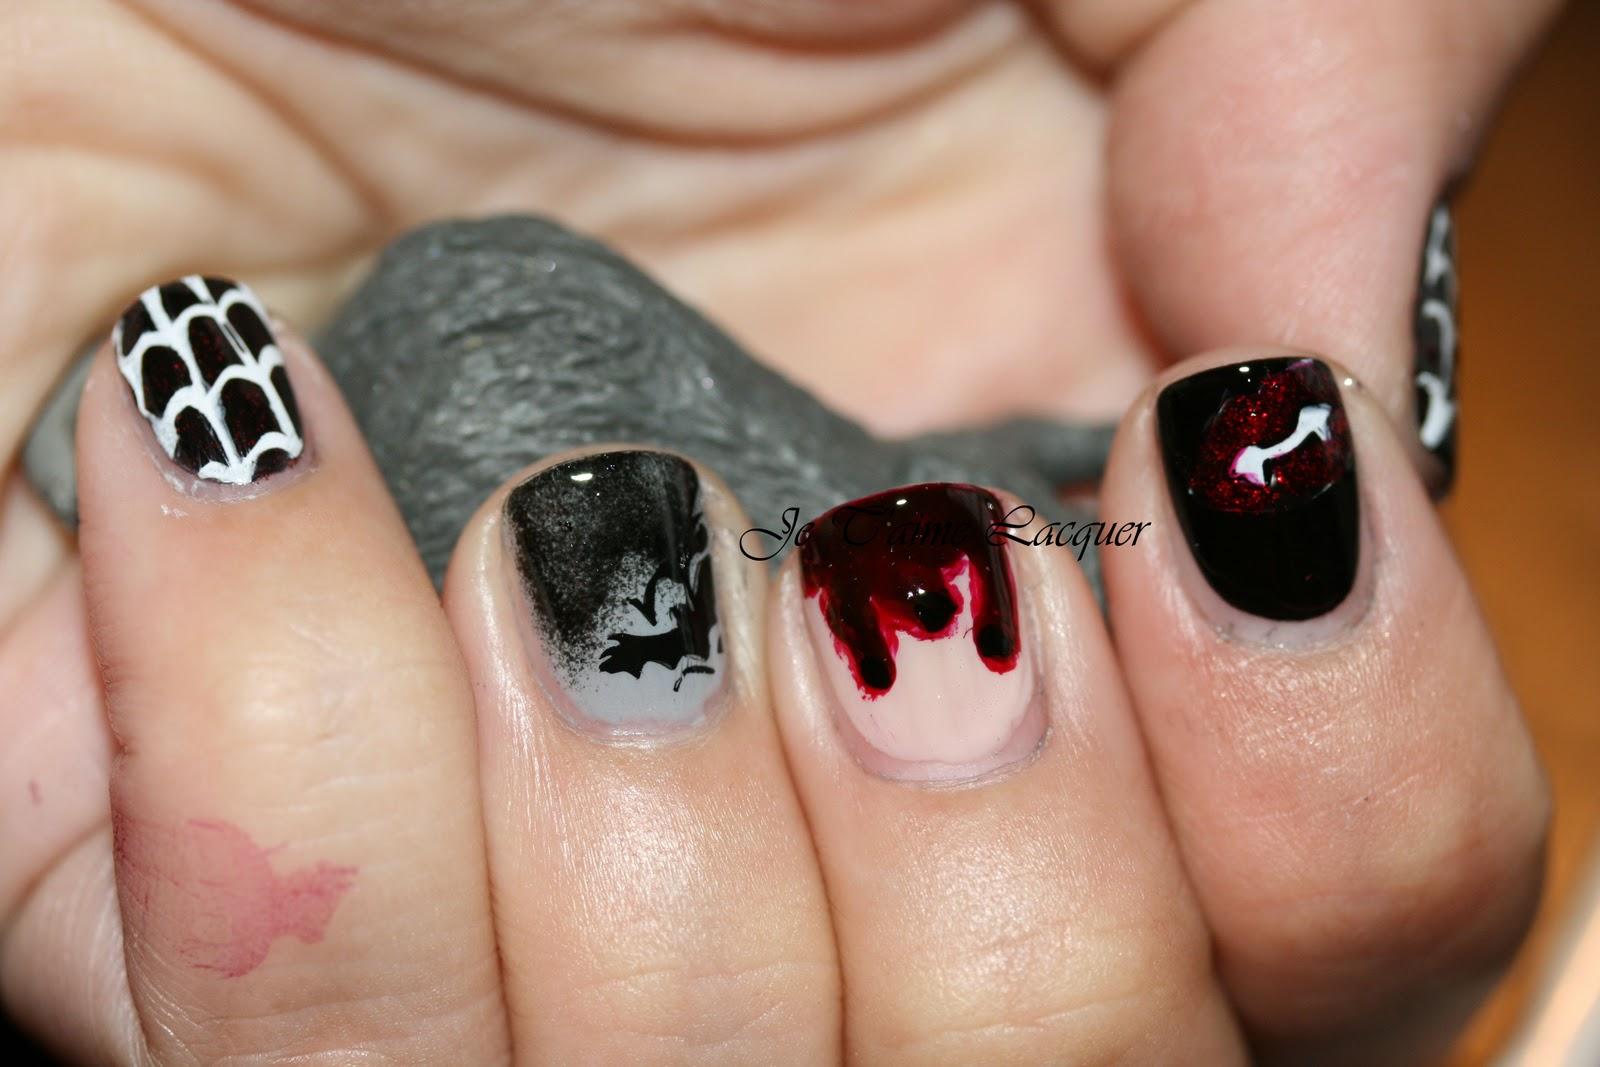 http://3.bp.blogspot.com/--A6c4rZRLi4/Tn39R6EBiII/AAAAAAAAANk/bgJOvNsaEFI/s1600/Dracula+Nails1+copy.jpg